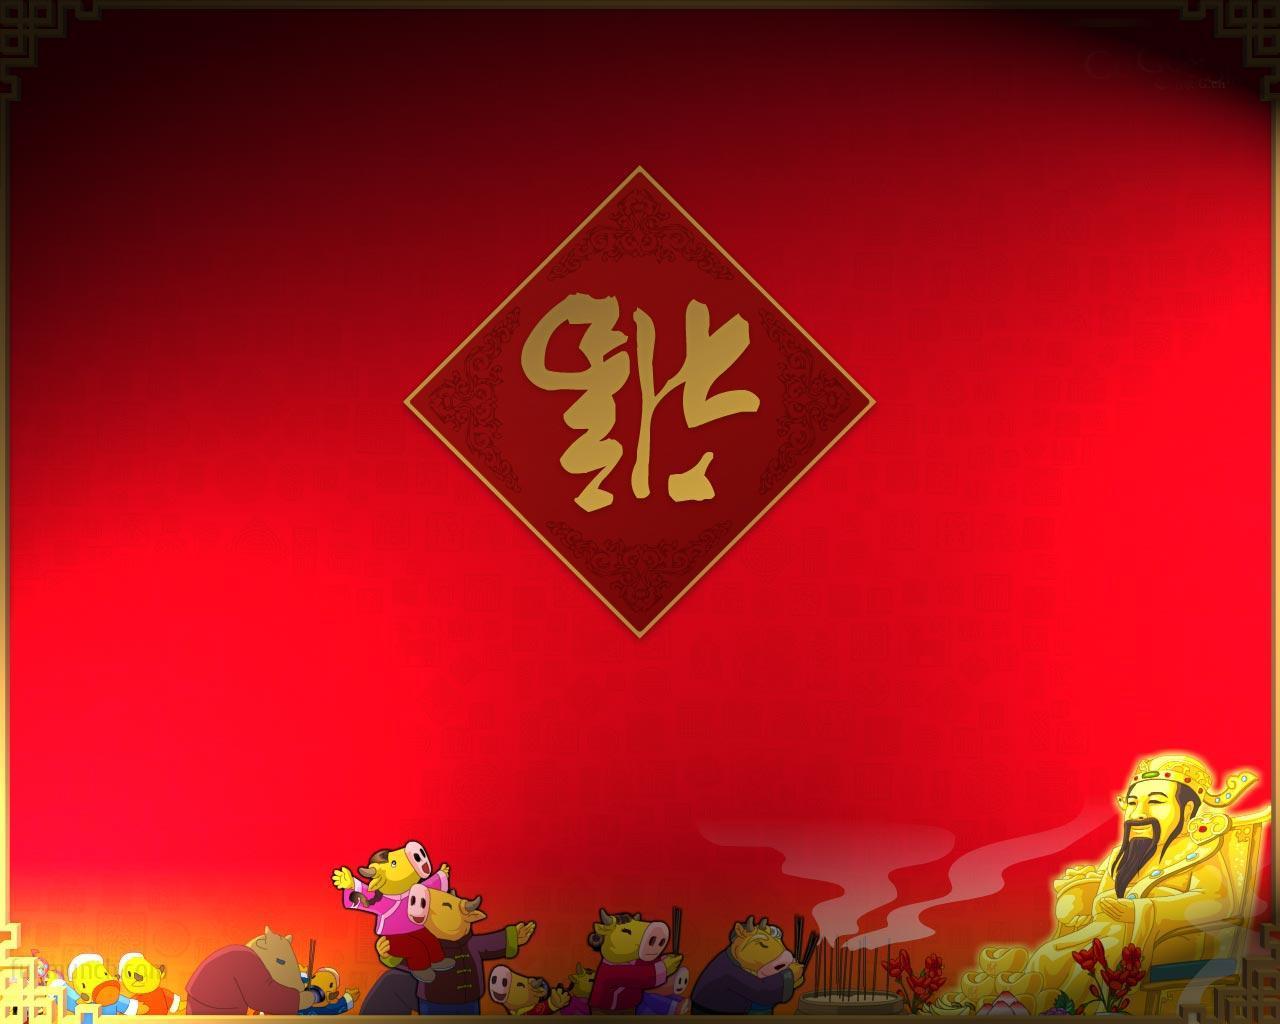 Chinese New Years Wallpaper Desktop 12814 Wallpaper Cool 1280x1024